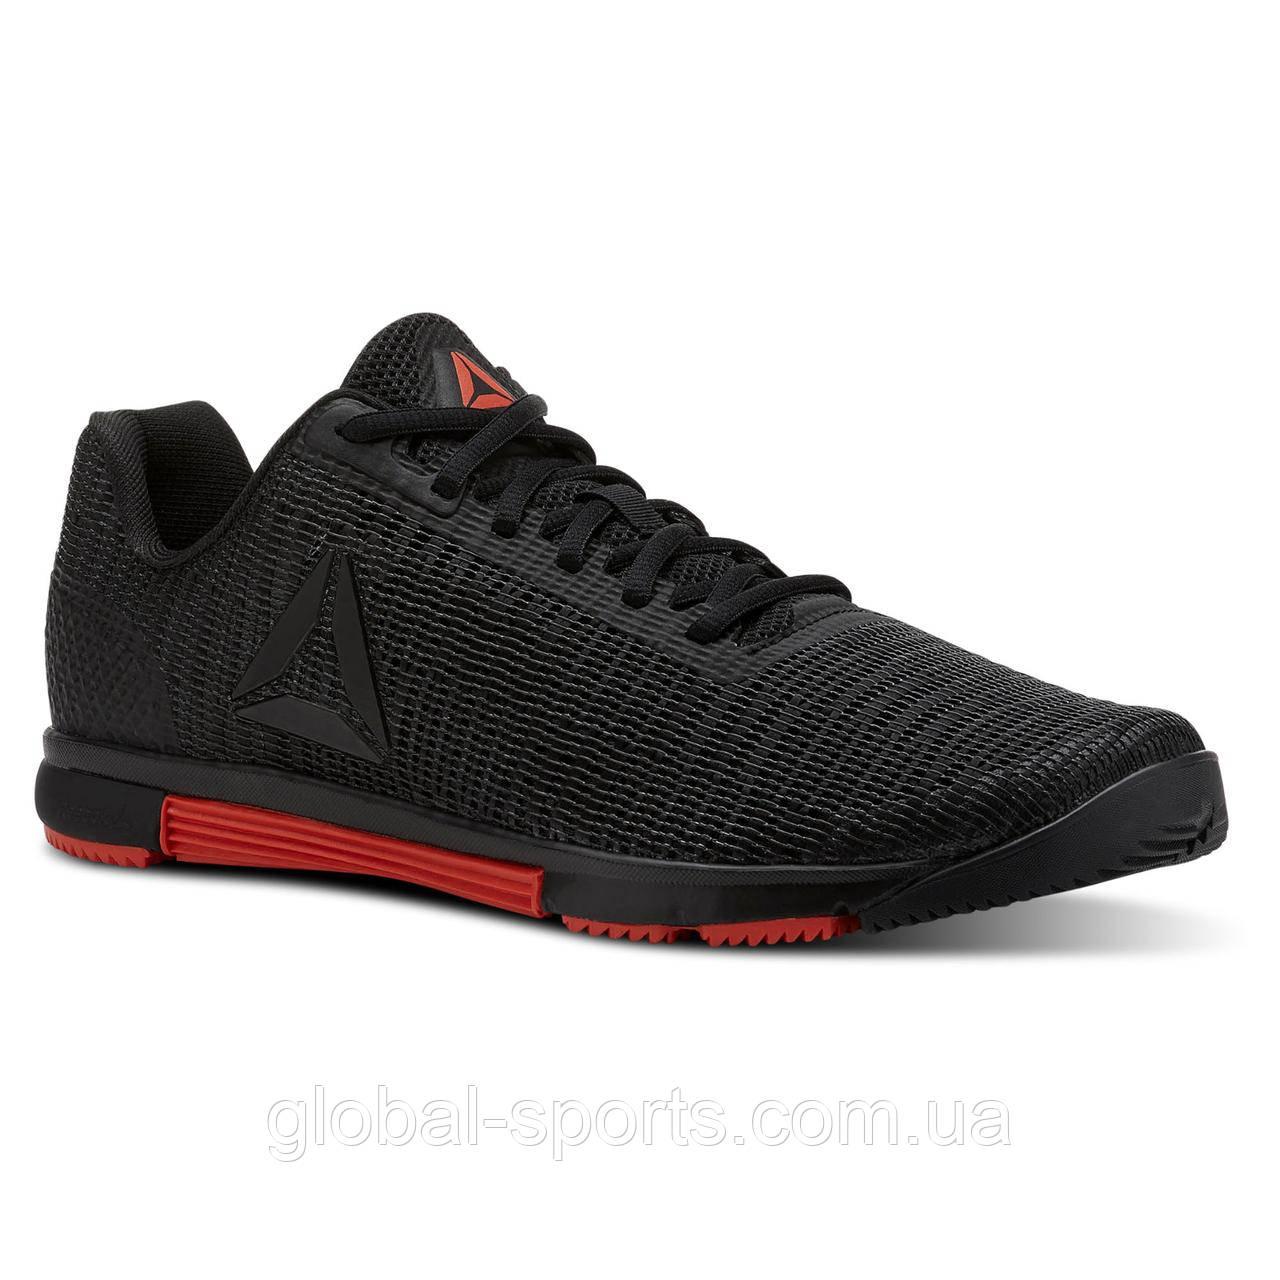 Мужские кроссовки Reebok Speed TR Flexweave(Артикул:CN5499)